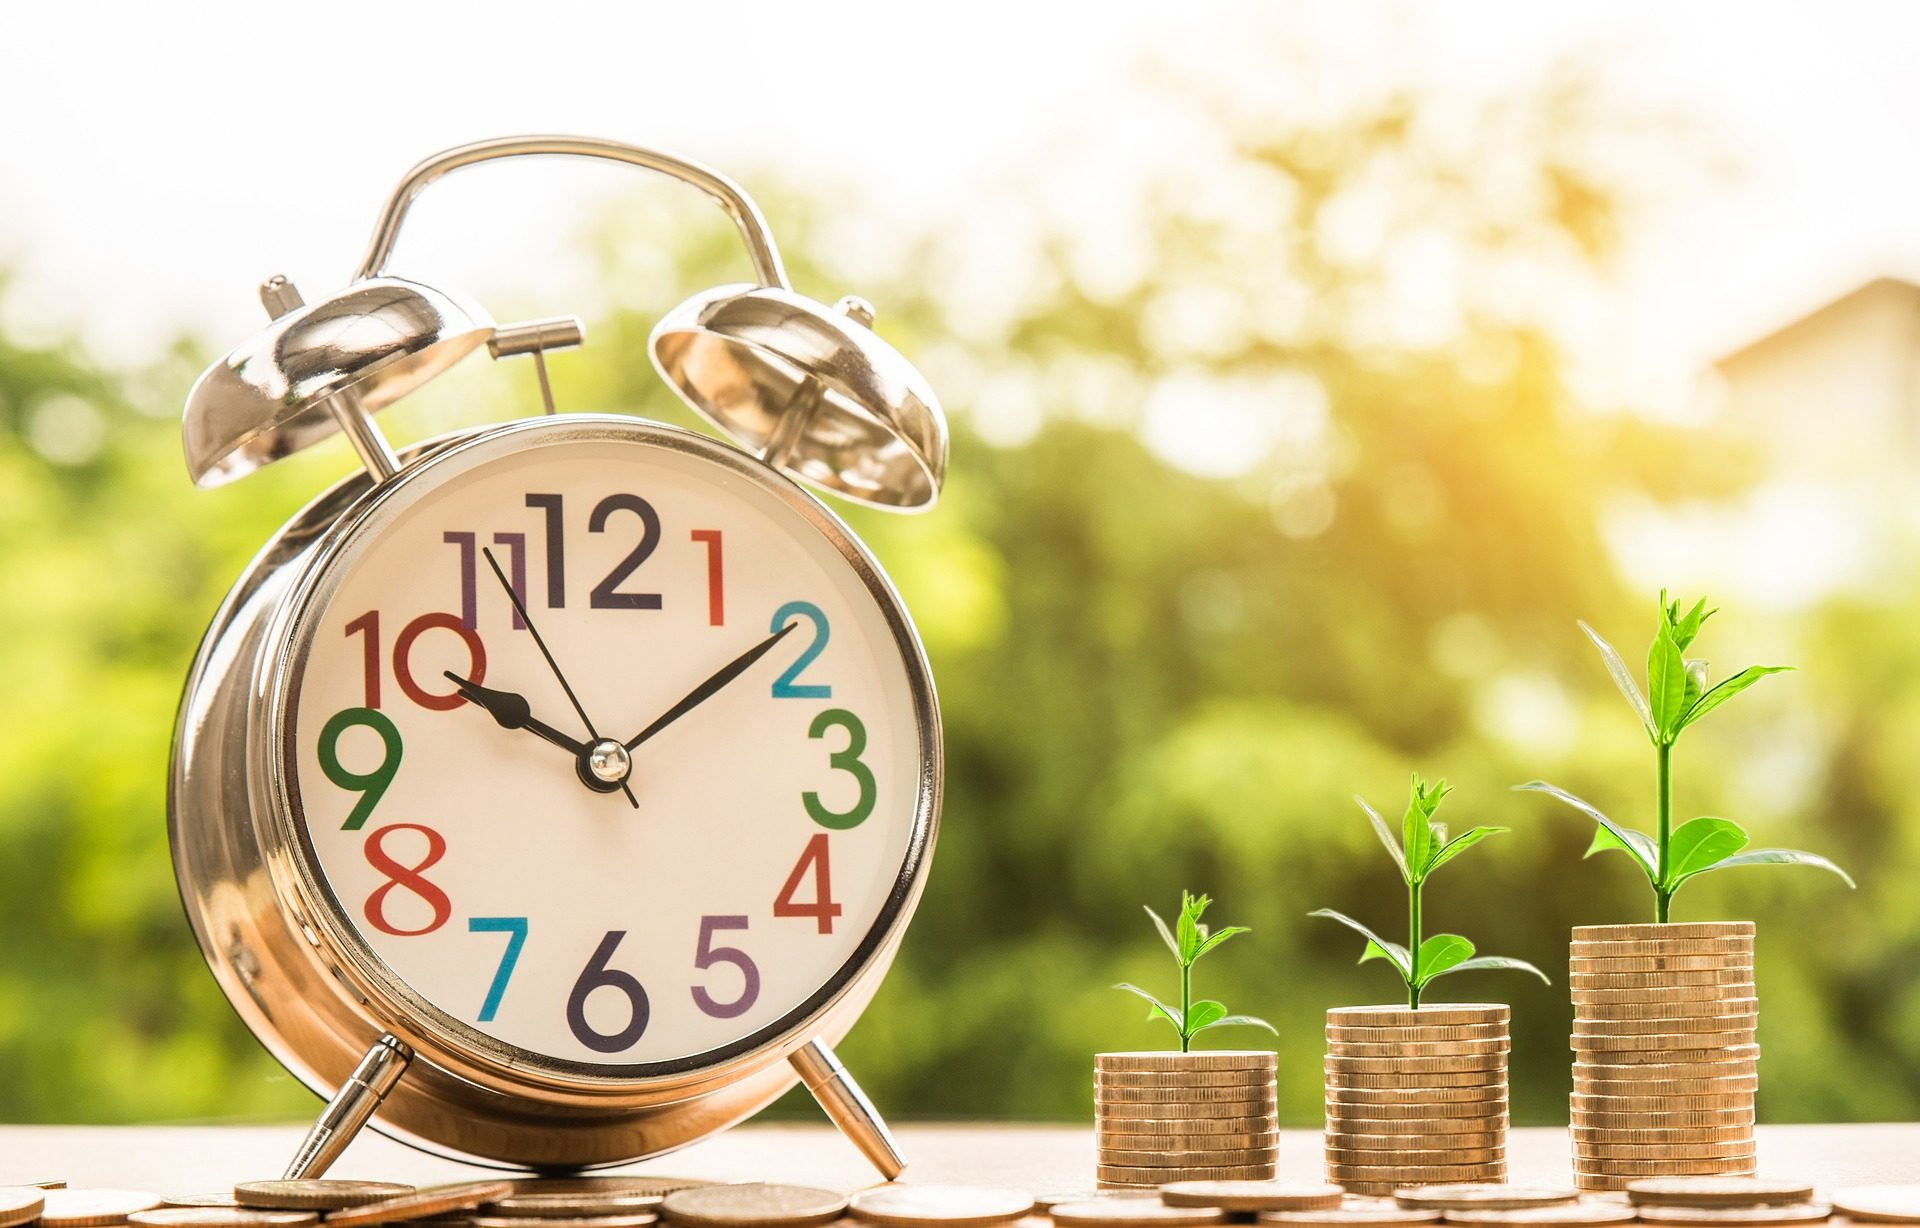 reloj, despertador, hora, tiempo, monedas, plantas, brotes - Fondos de Pantalla HD - professor-falken.com